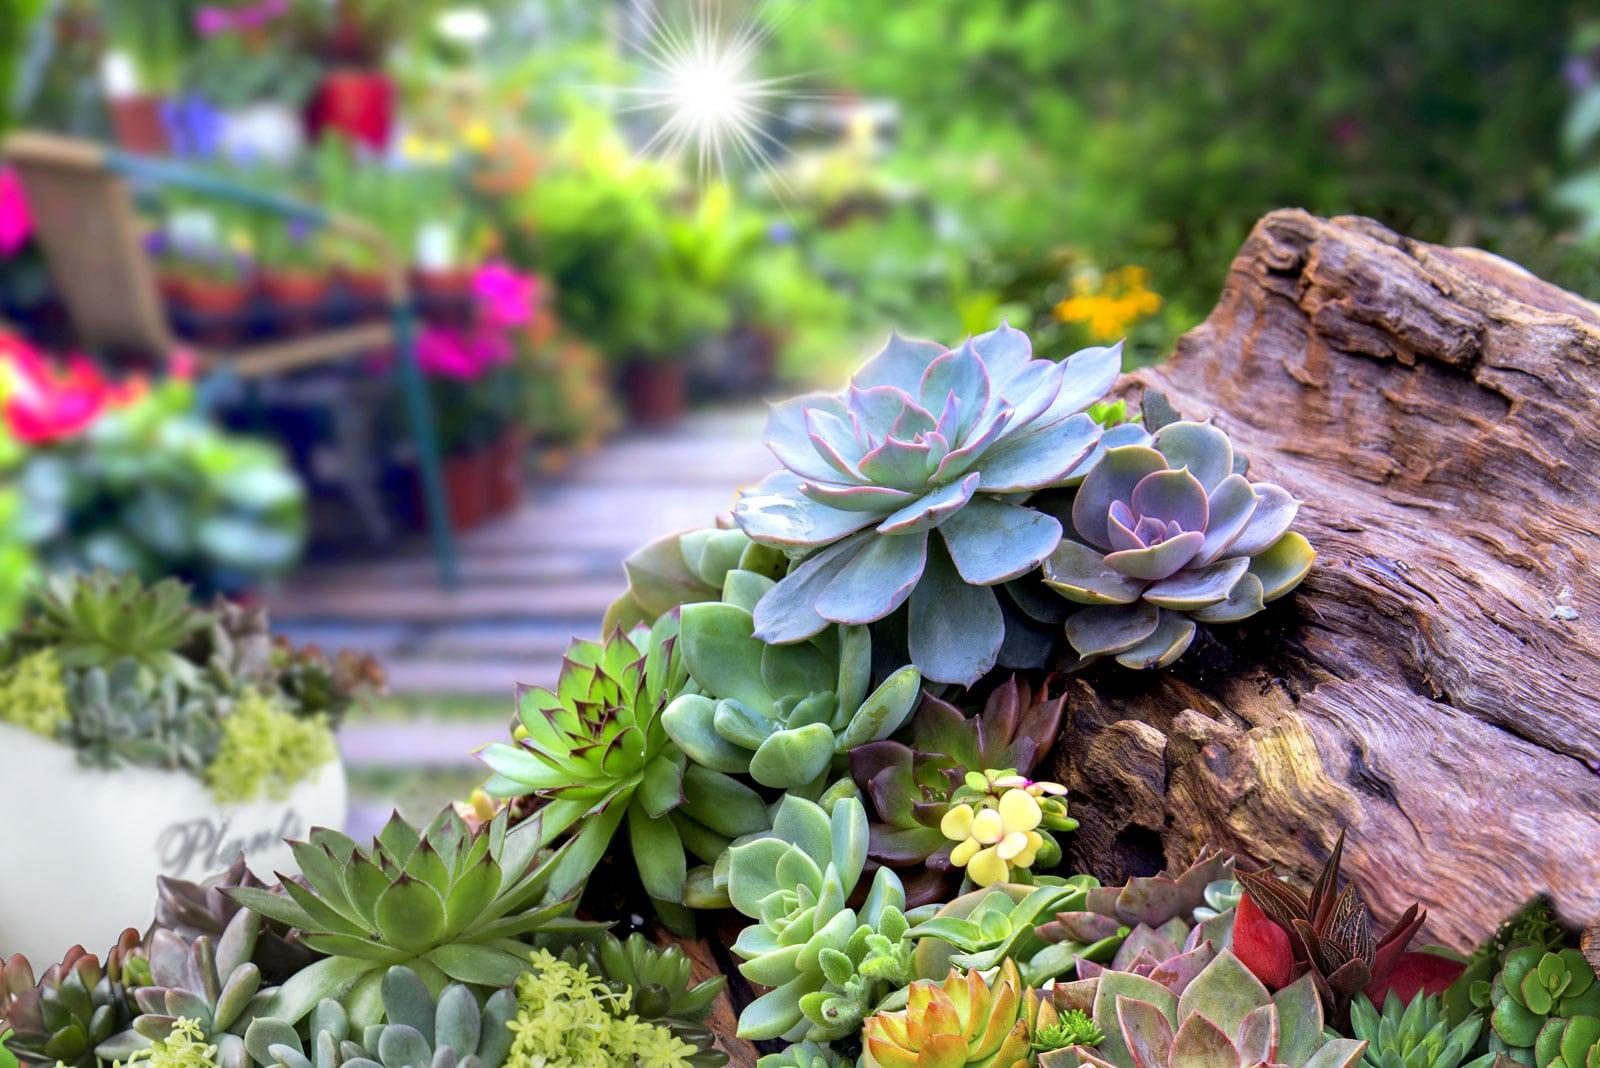 Preparing A Succulent Garden Bed How To Prepare Soil For A Succulent Garden